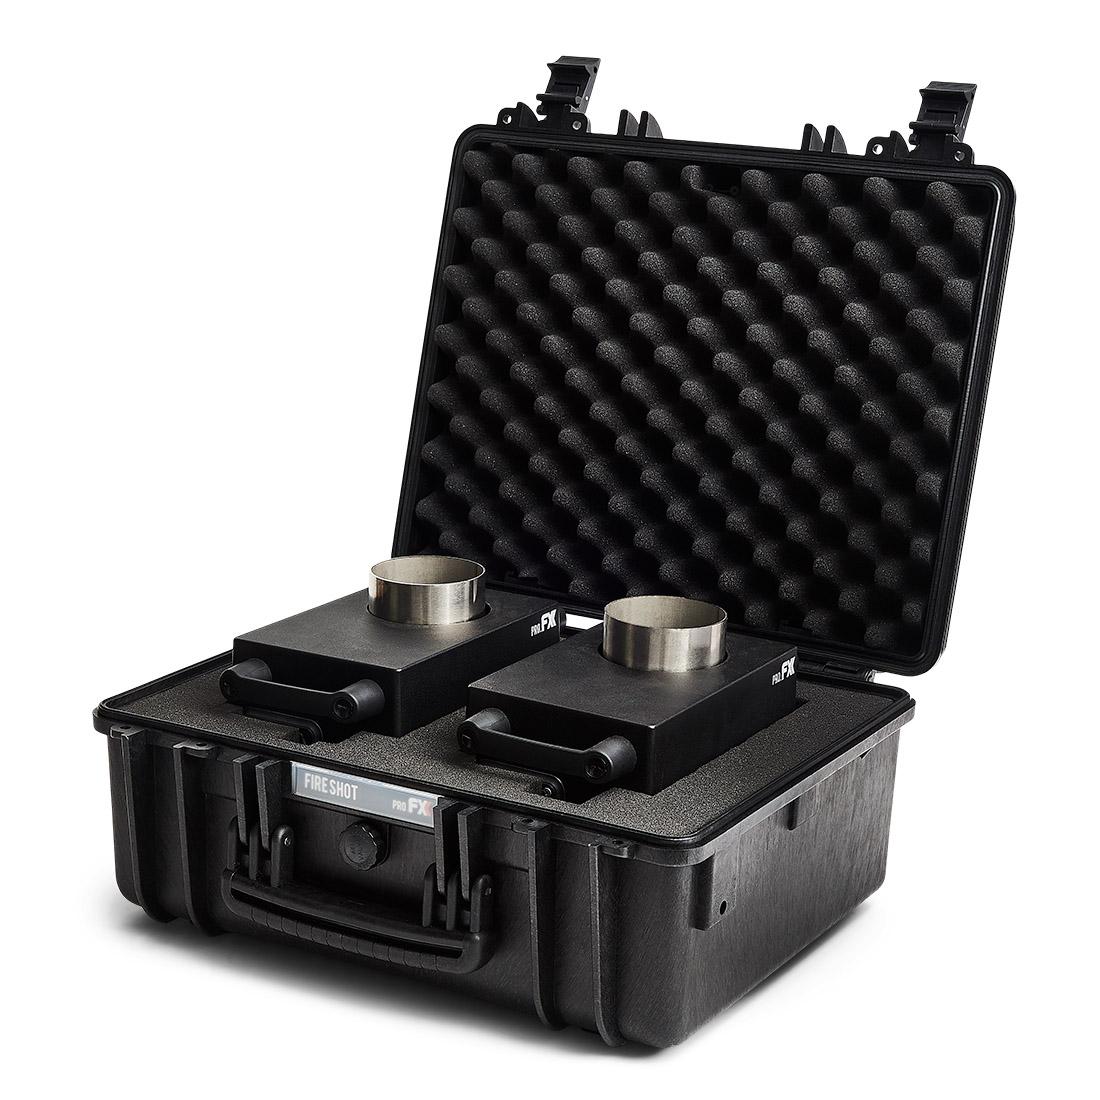 Pro.FX fireshot case